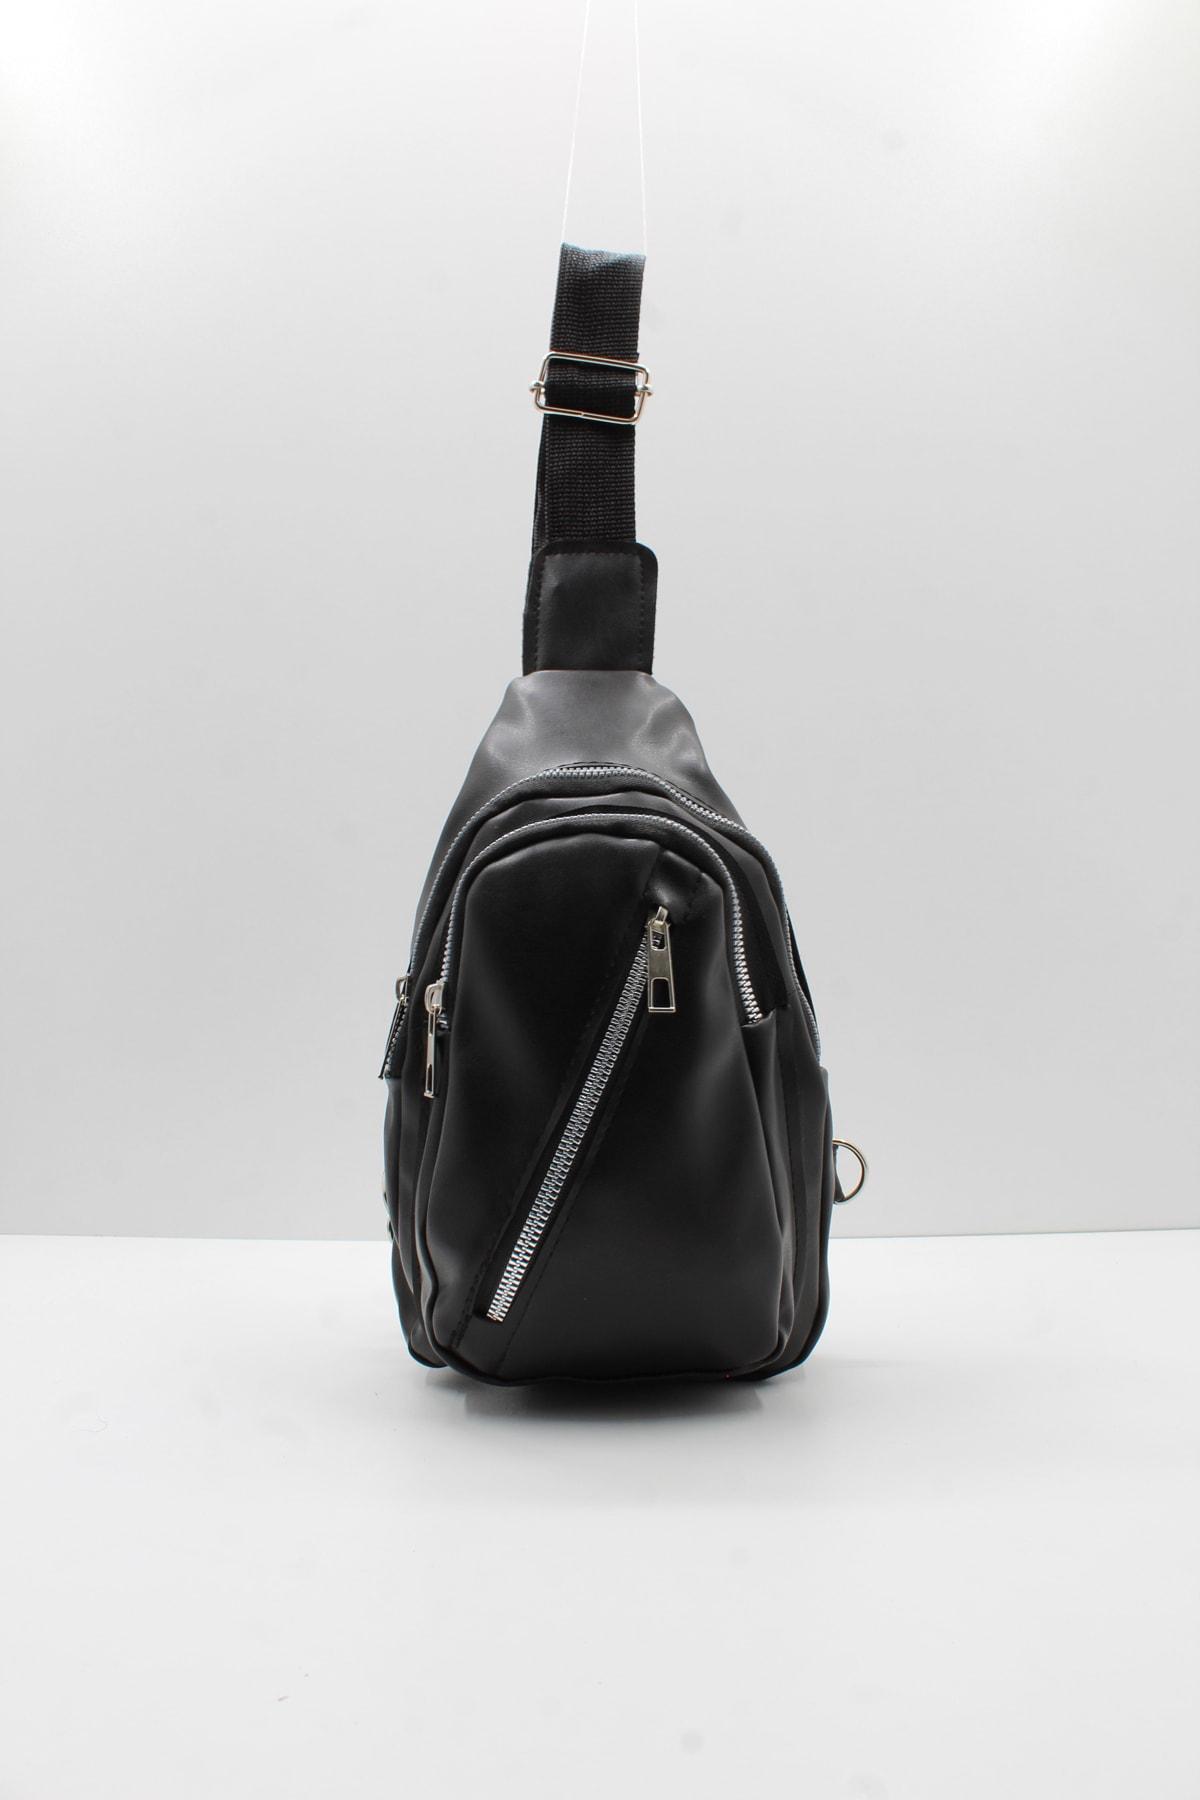 Women's Soft Leather Cross And Waist Bag With Three Compartments сумка женская сумка через плечо bags for women Наплечные сумки